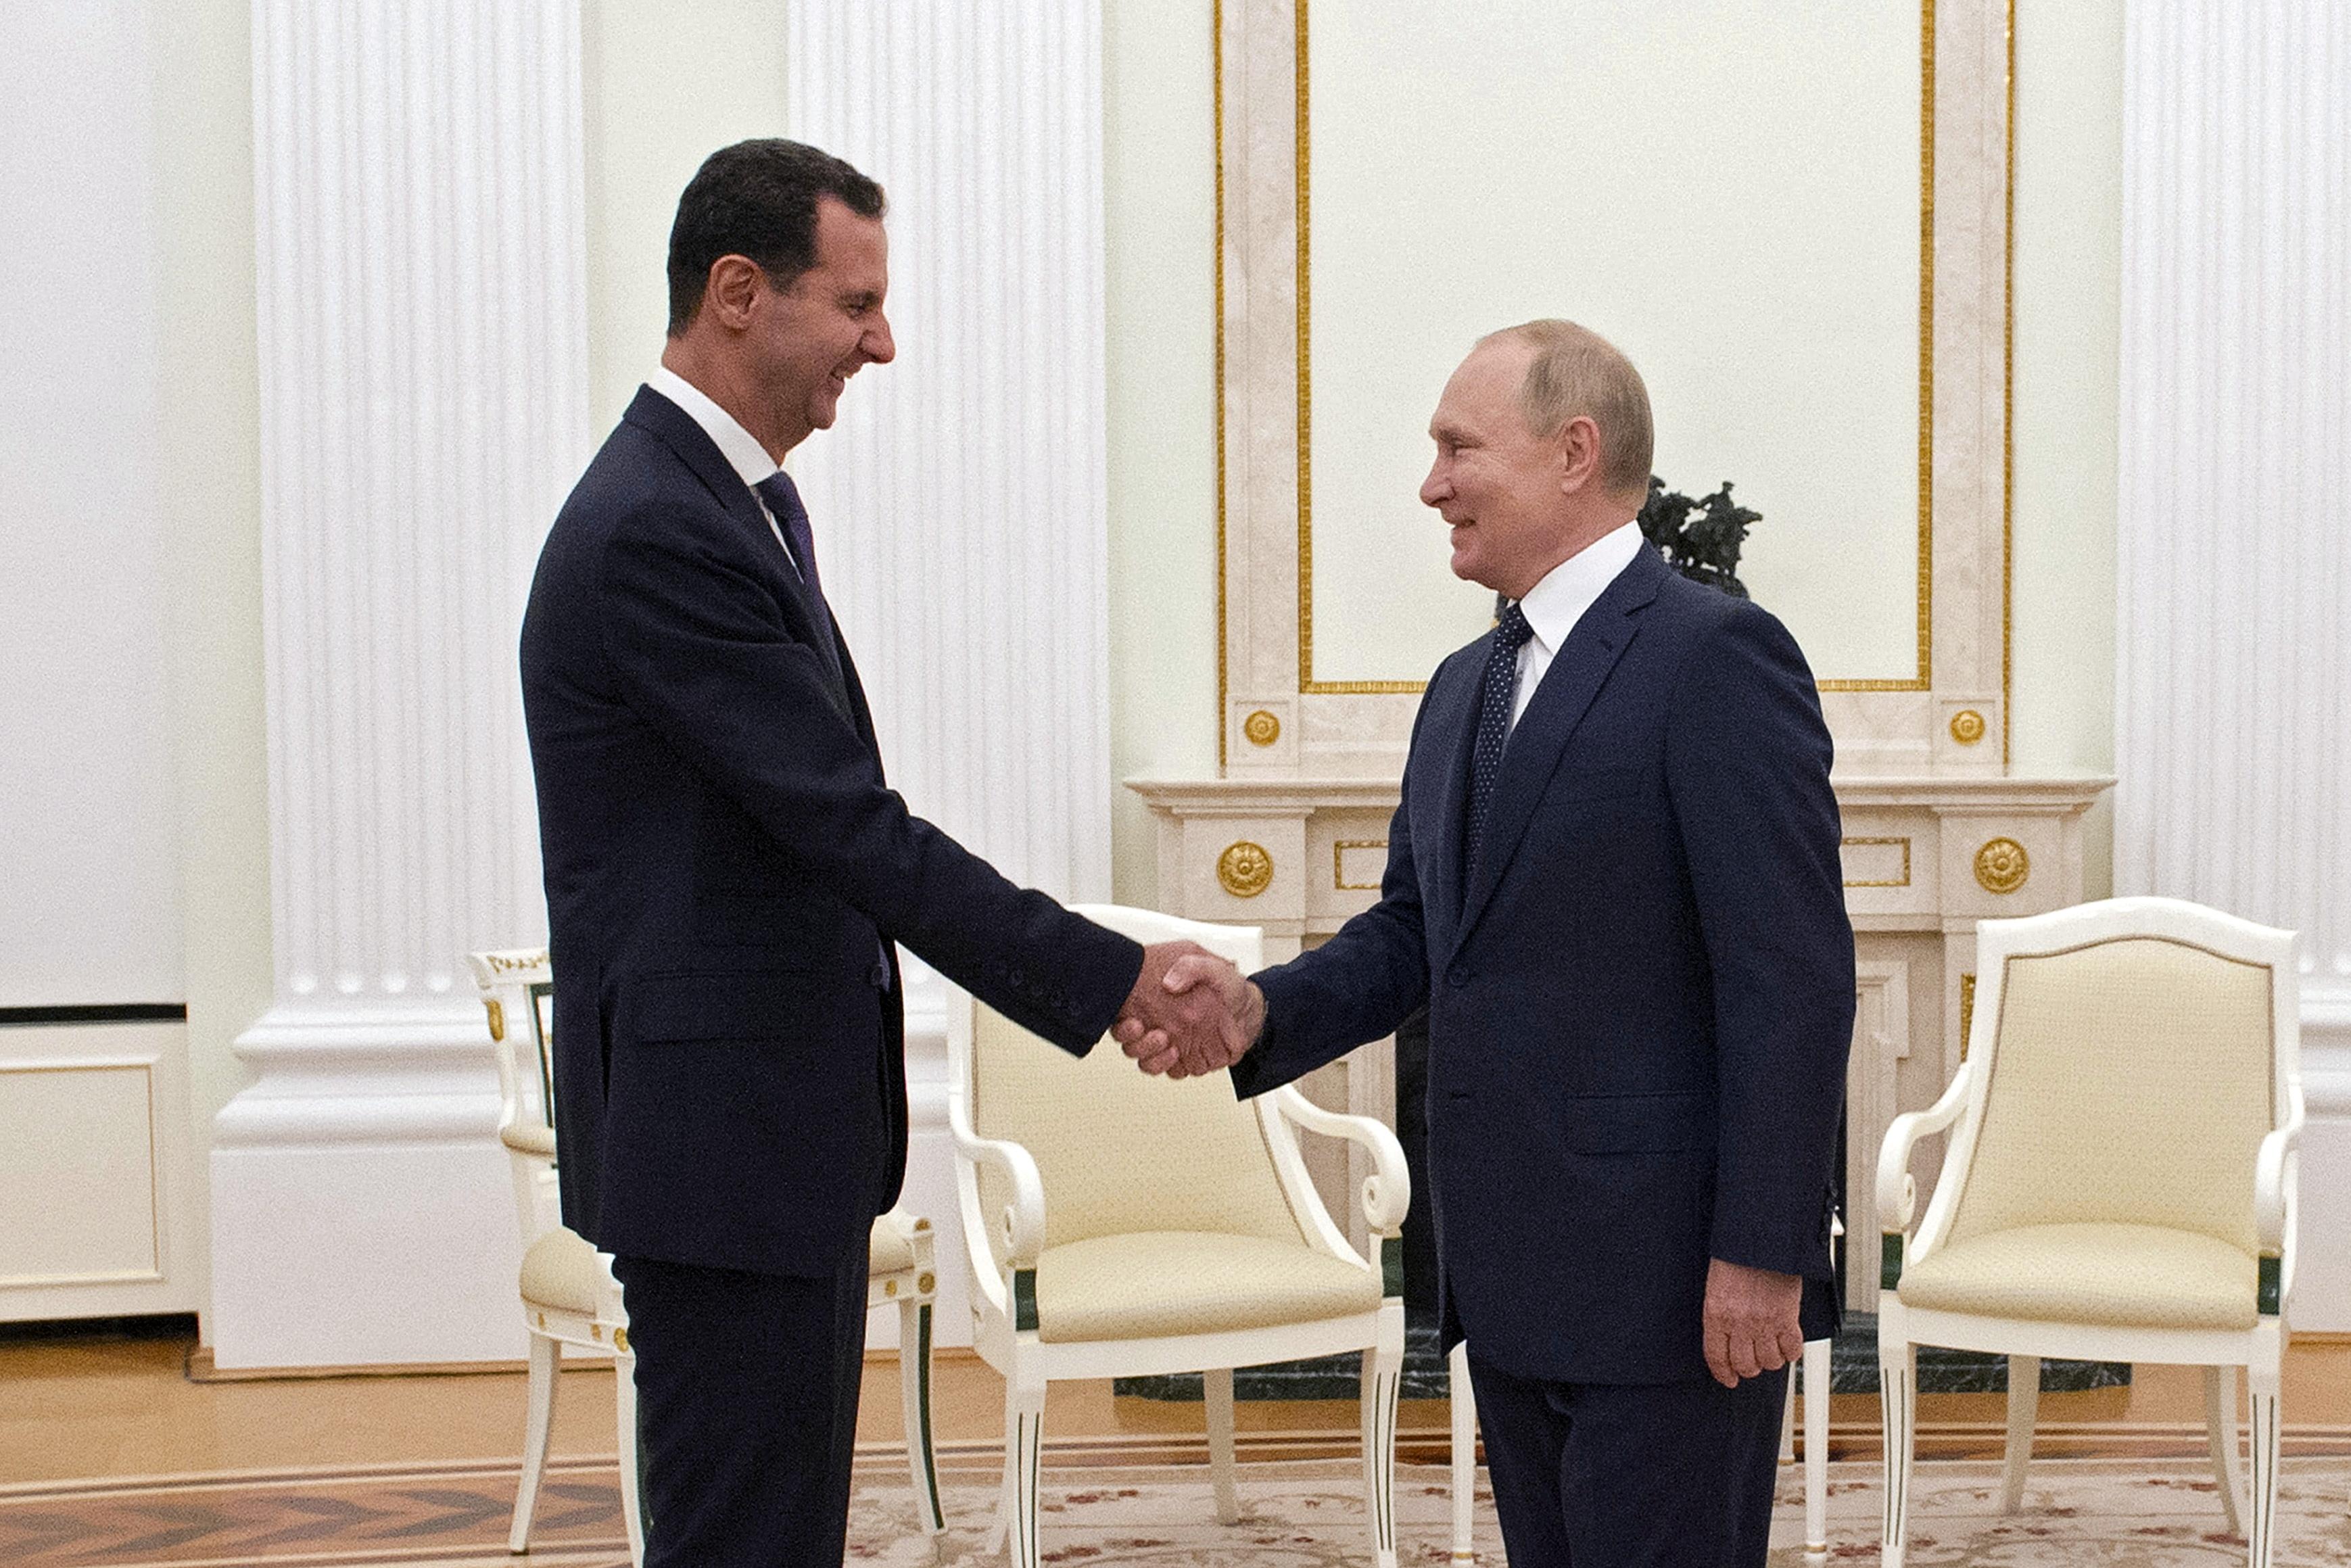 Russian President Vladimir Putin shakes hands with Syrian President Bashar al-Assad during a meeting at the Kremlin in Moscow, Russia, September 13, 2021. Picture taken September 13, 2021. Sputnik/Mikhail Klimentyev/Kremlin via REUTERS